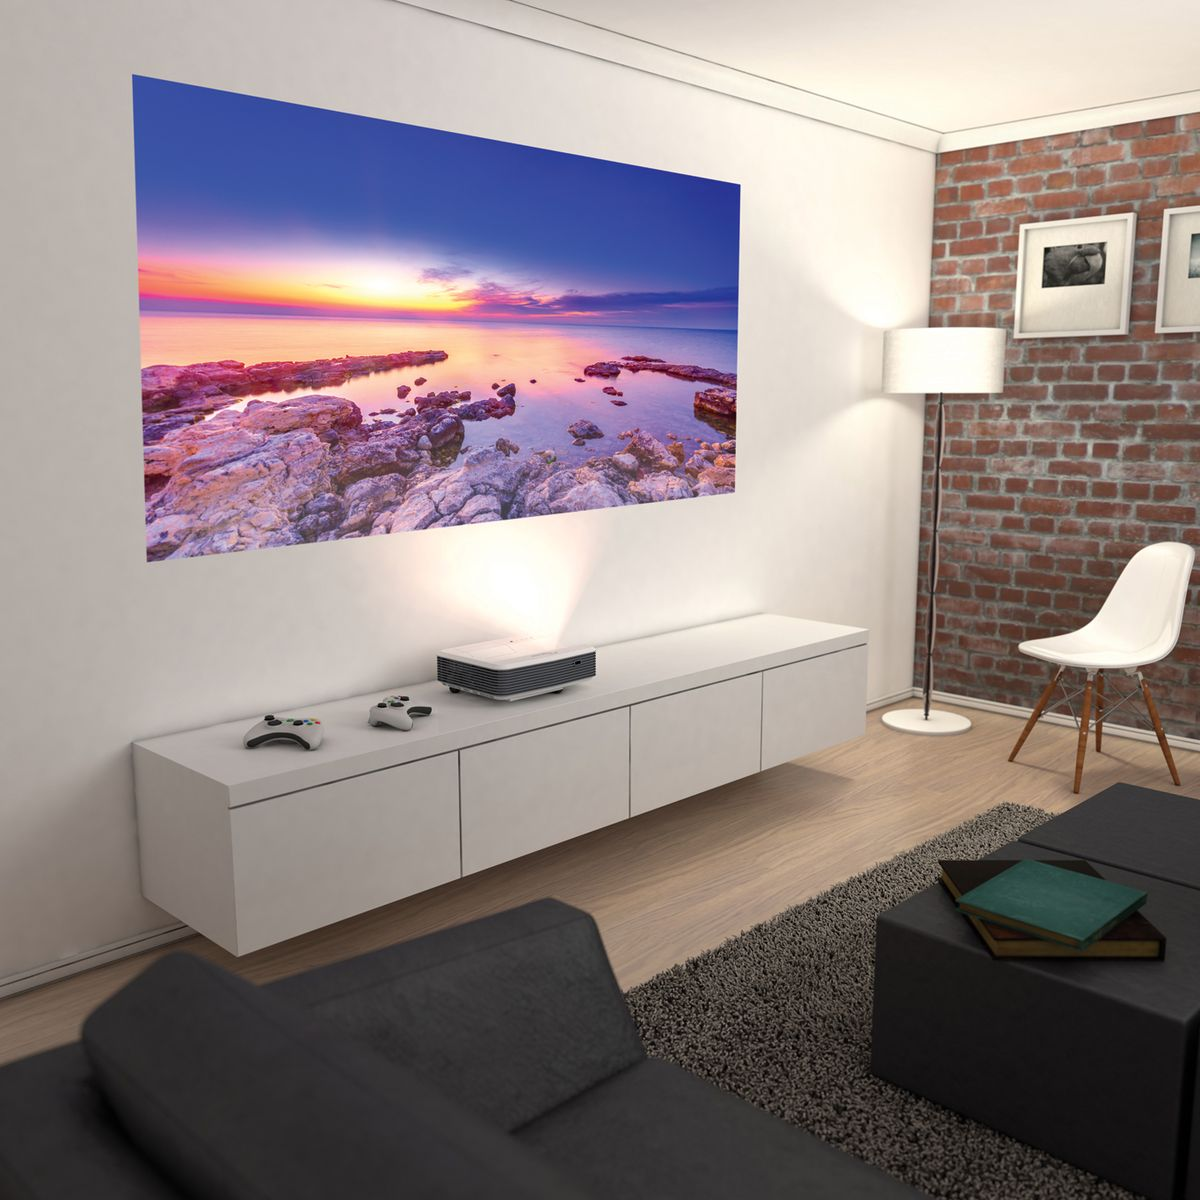 optoma gt5000 vid oprojecteurs son vid. Black Bedroom Furniture Sets. Home Design Ideas